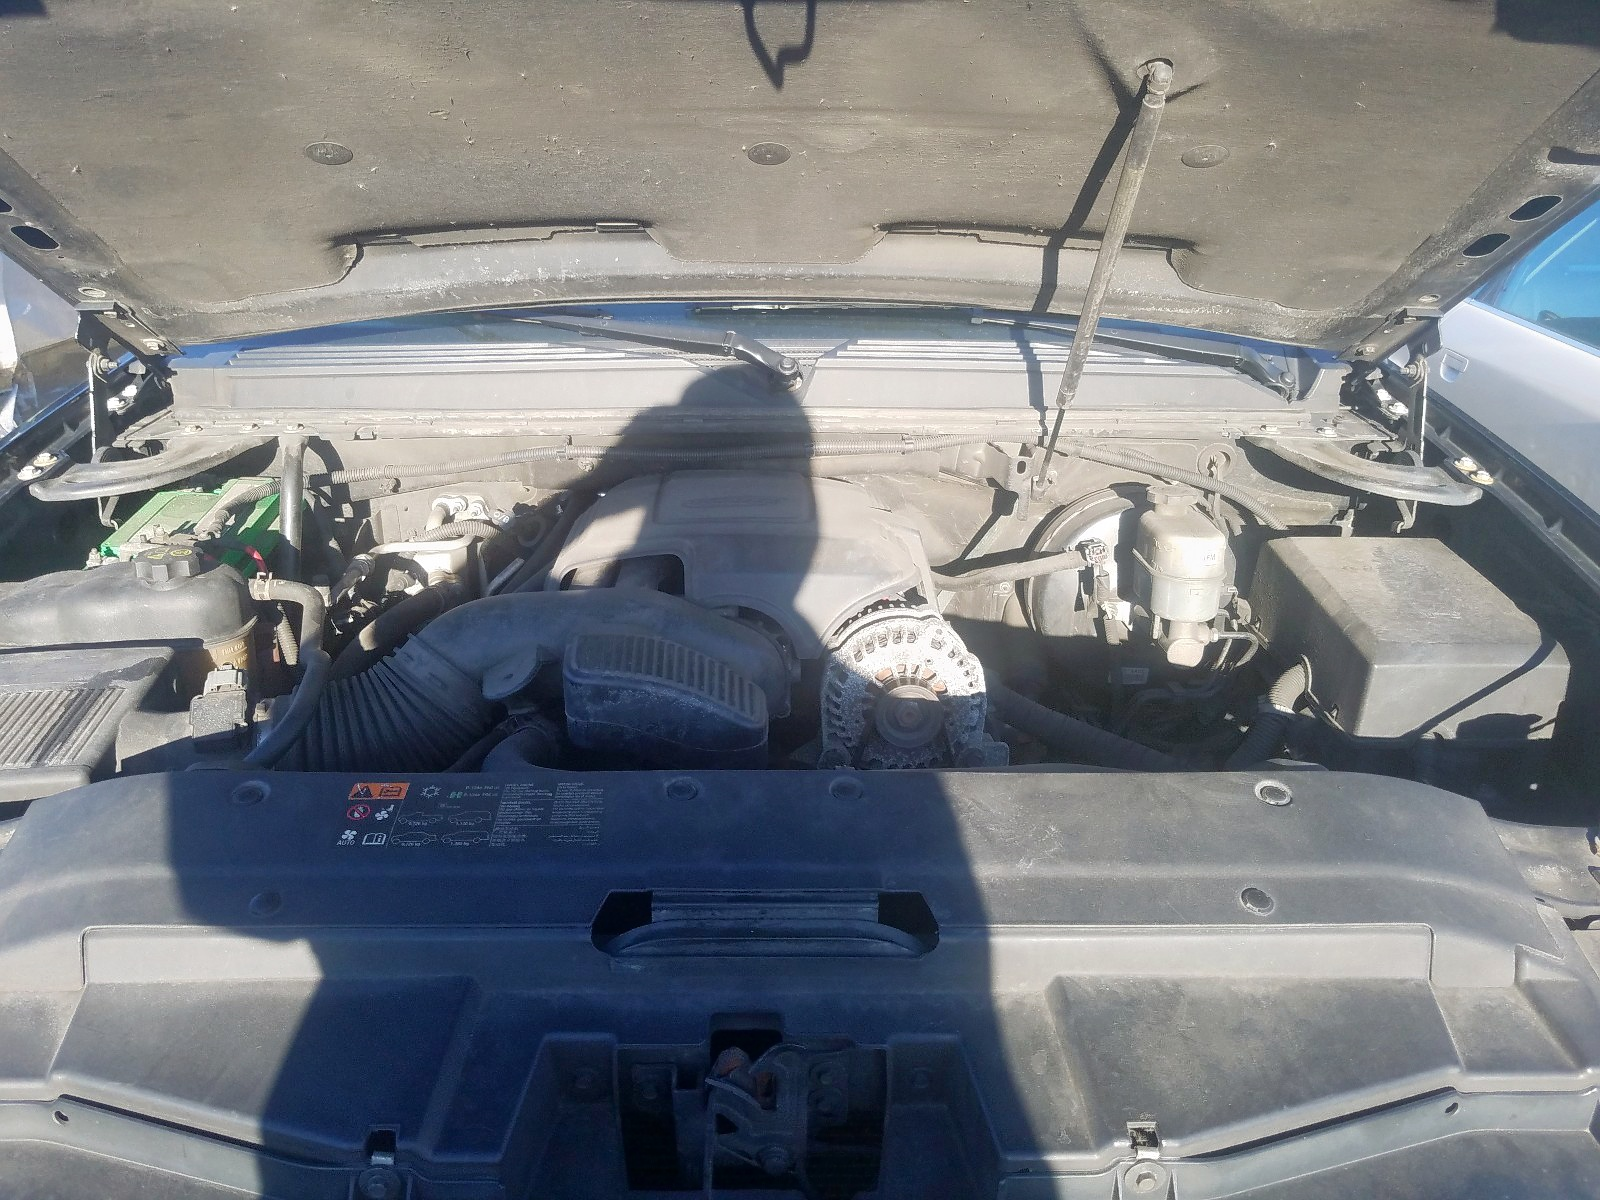 2012 Chevrolet Suburban K 5.3L inside view